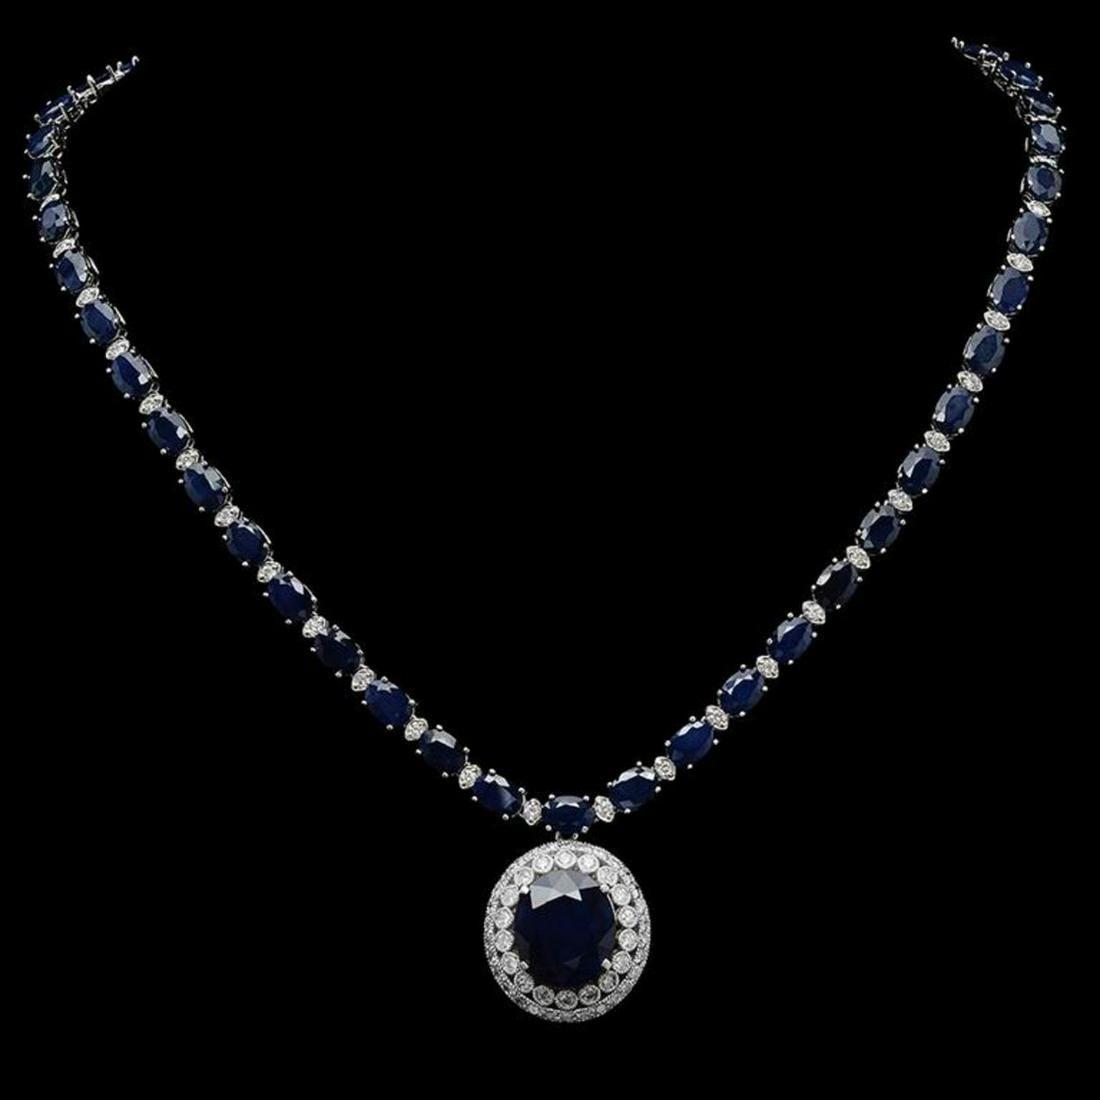 K Gold 51.02 ct Sapphire & 3.31 ct Diamond Necklace